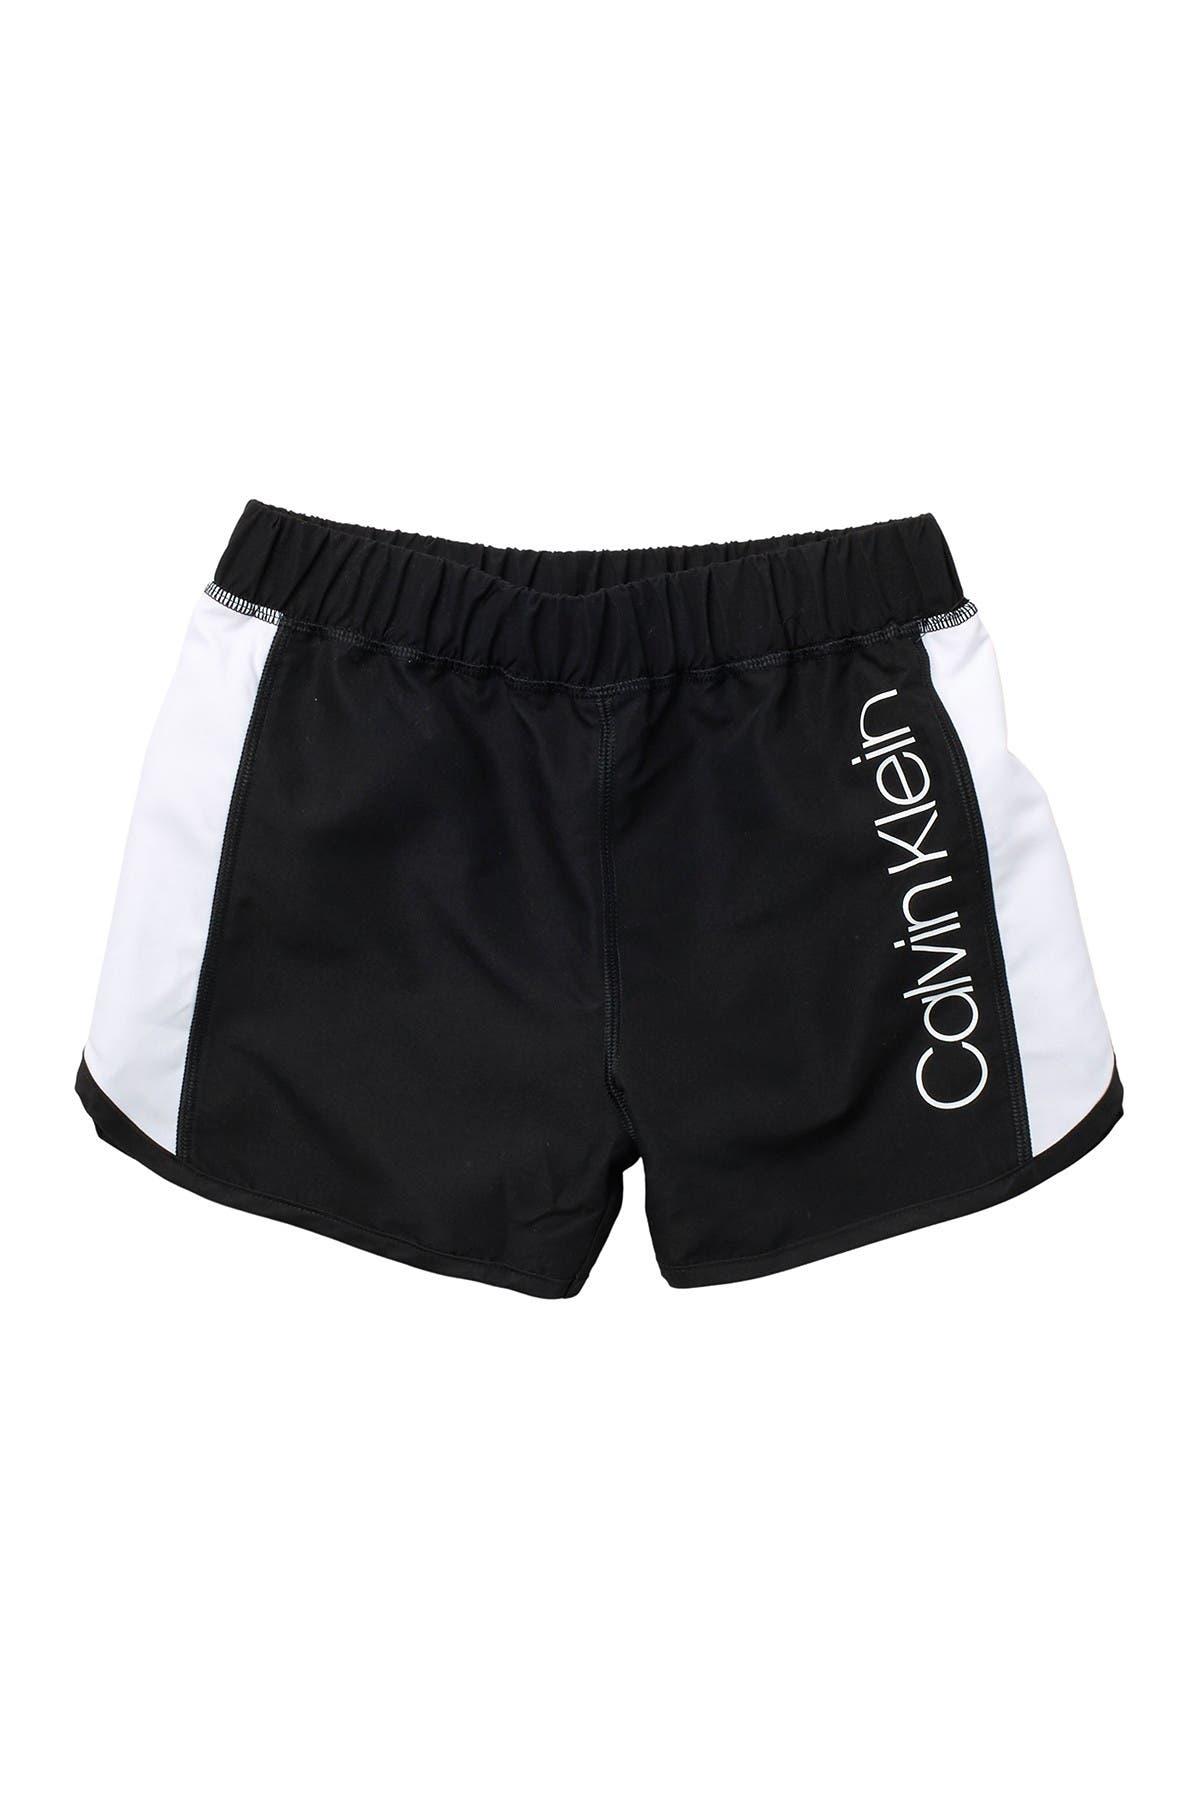 Calvin Klein Colorblock Tulip Shorts